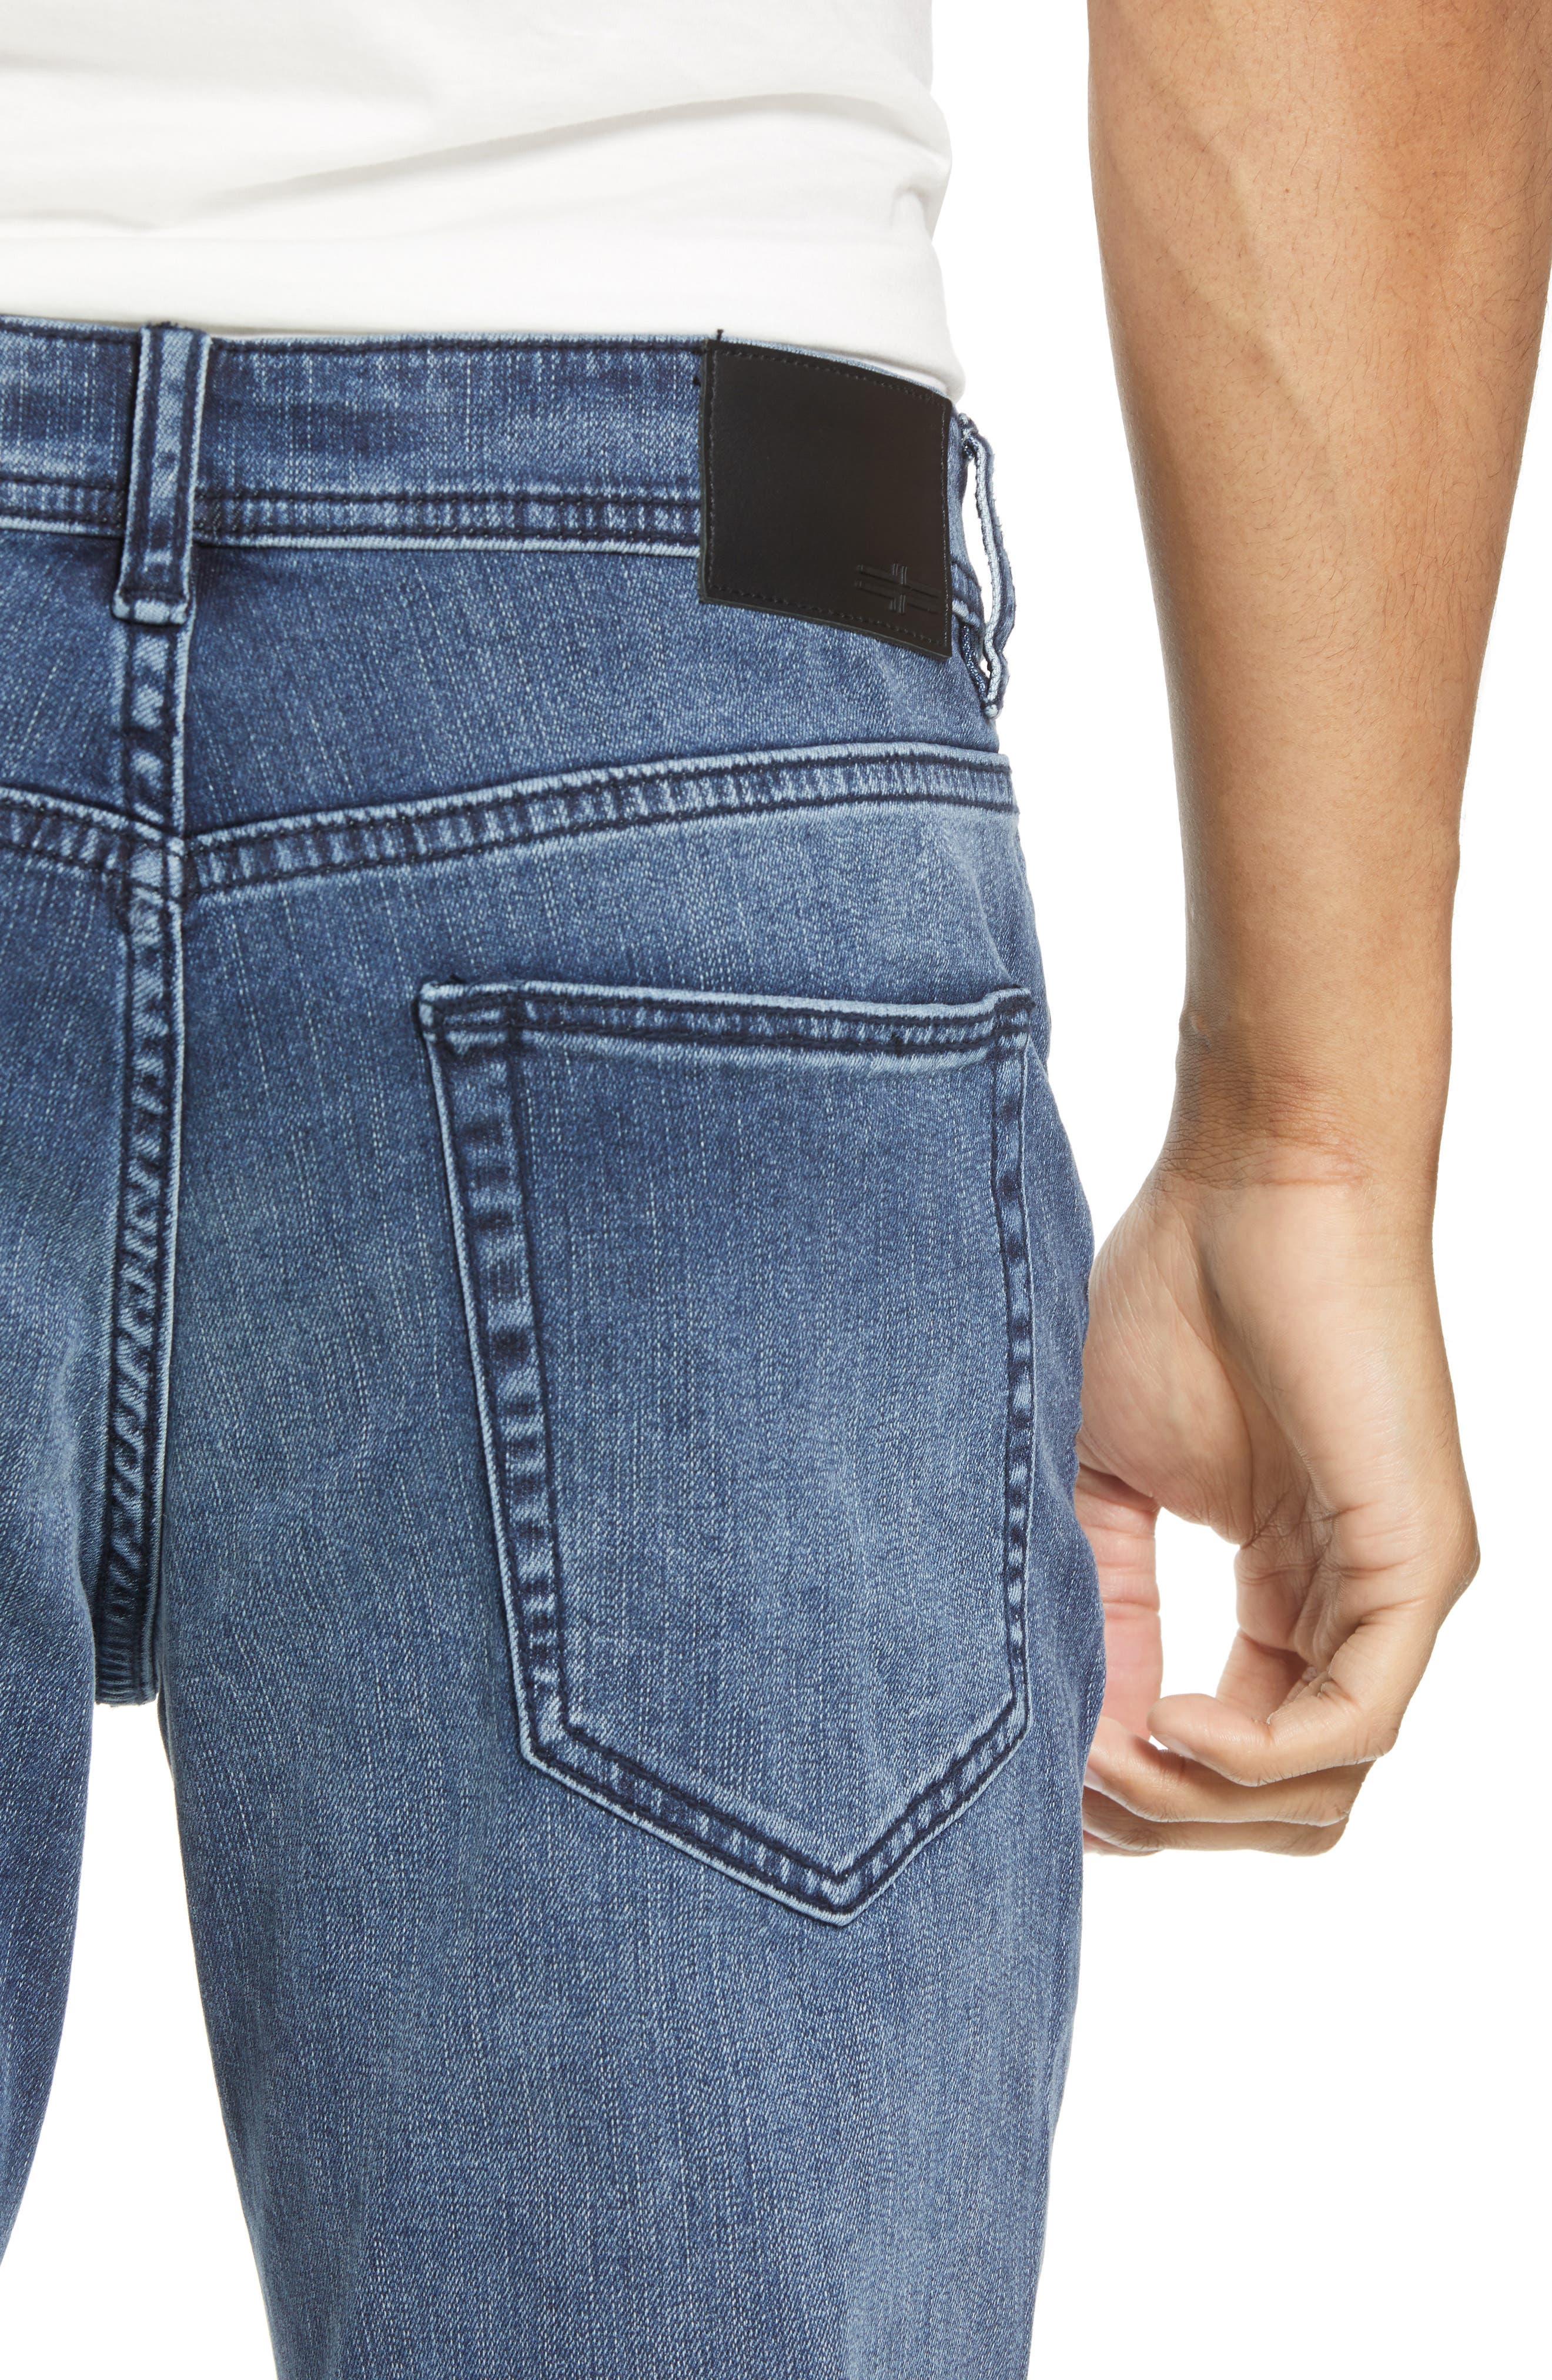 Jeans Co. Slim Straight Leg Jeans,                             Alternate thumbnail 4, color,                             Southaven Mid Blue